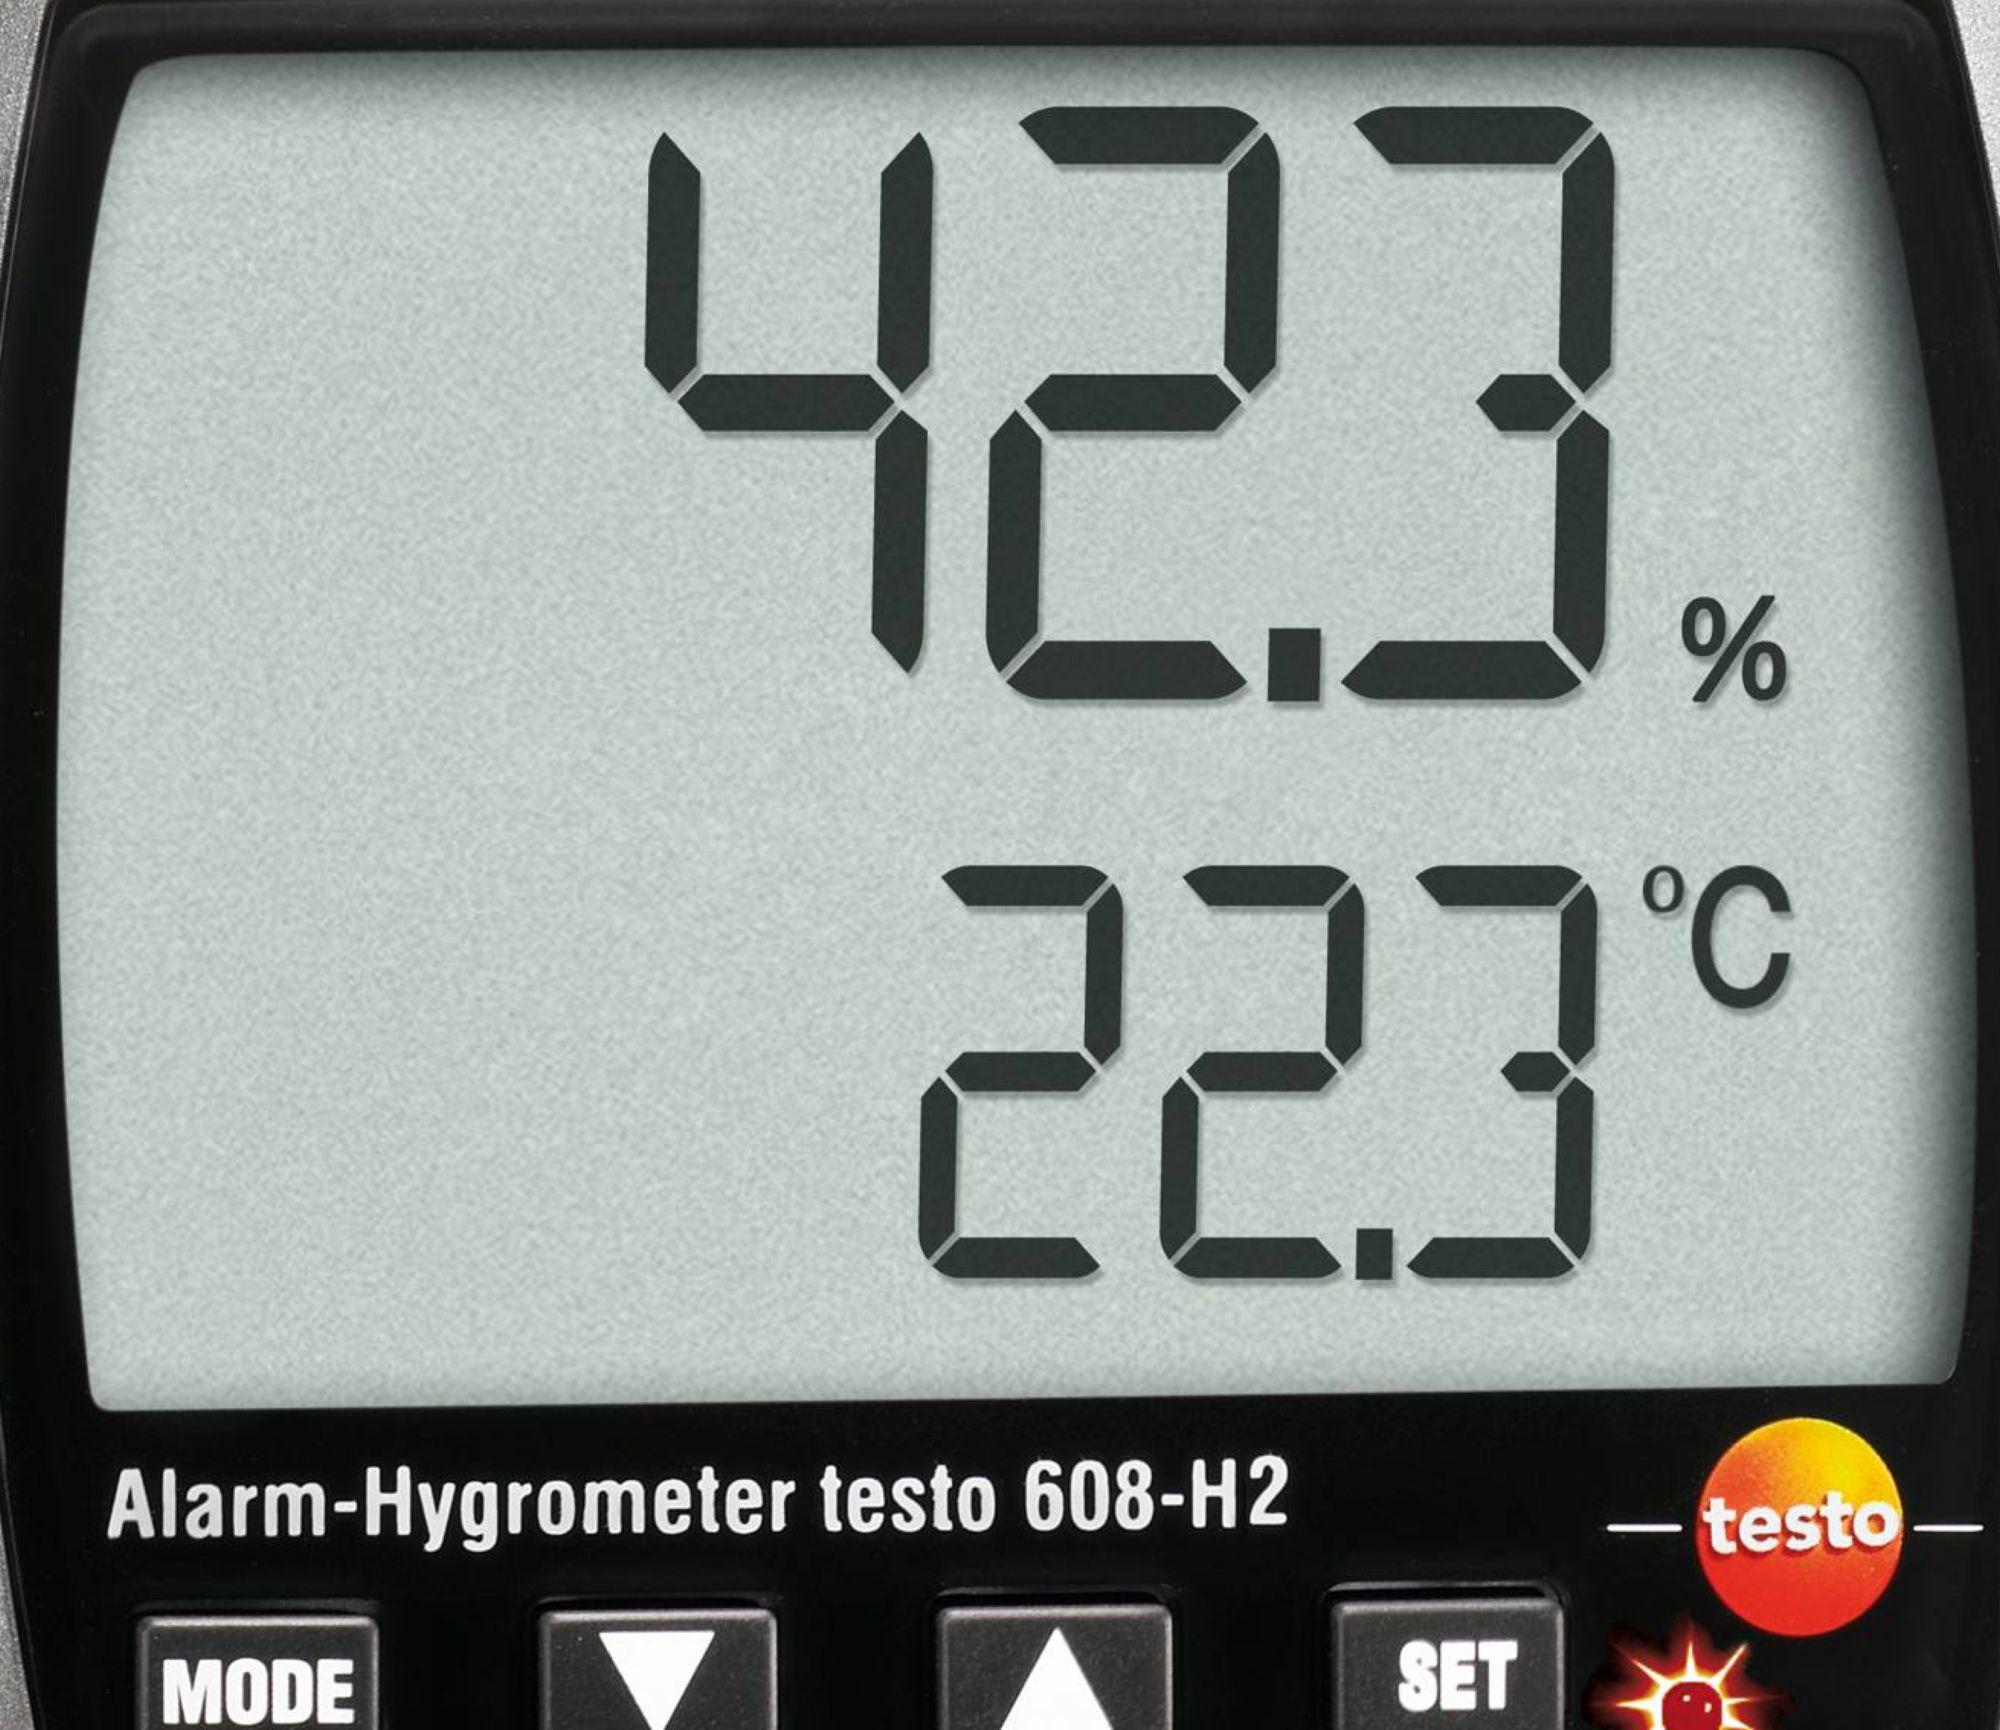 testo 608-H2 Thermohygrometer